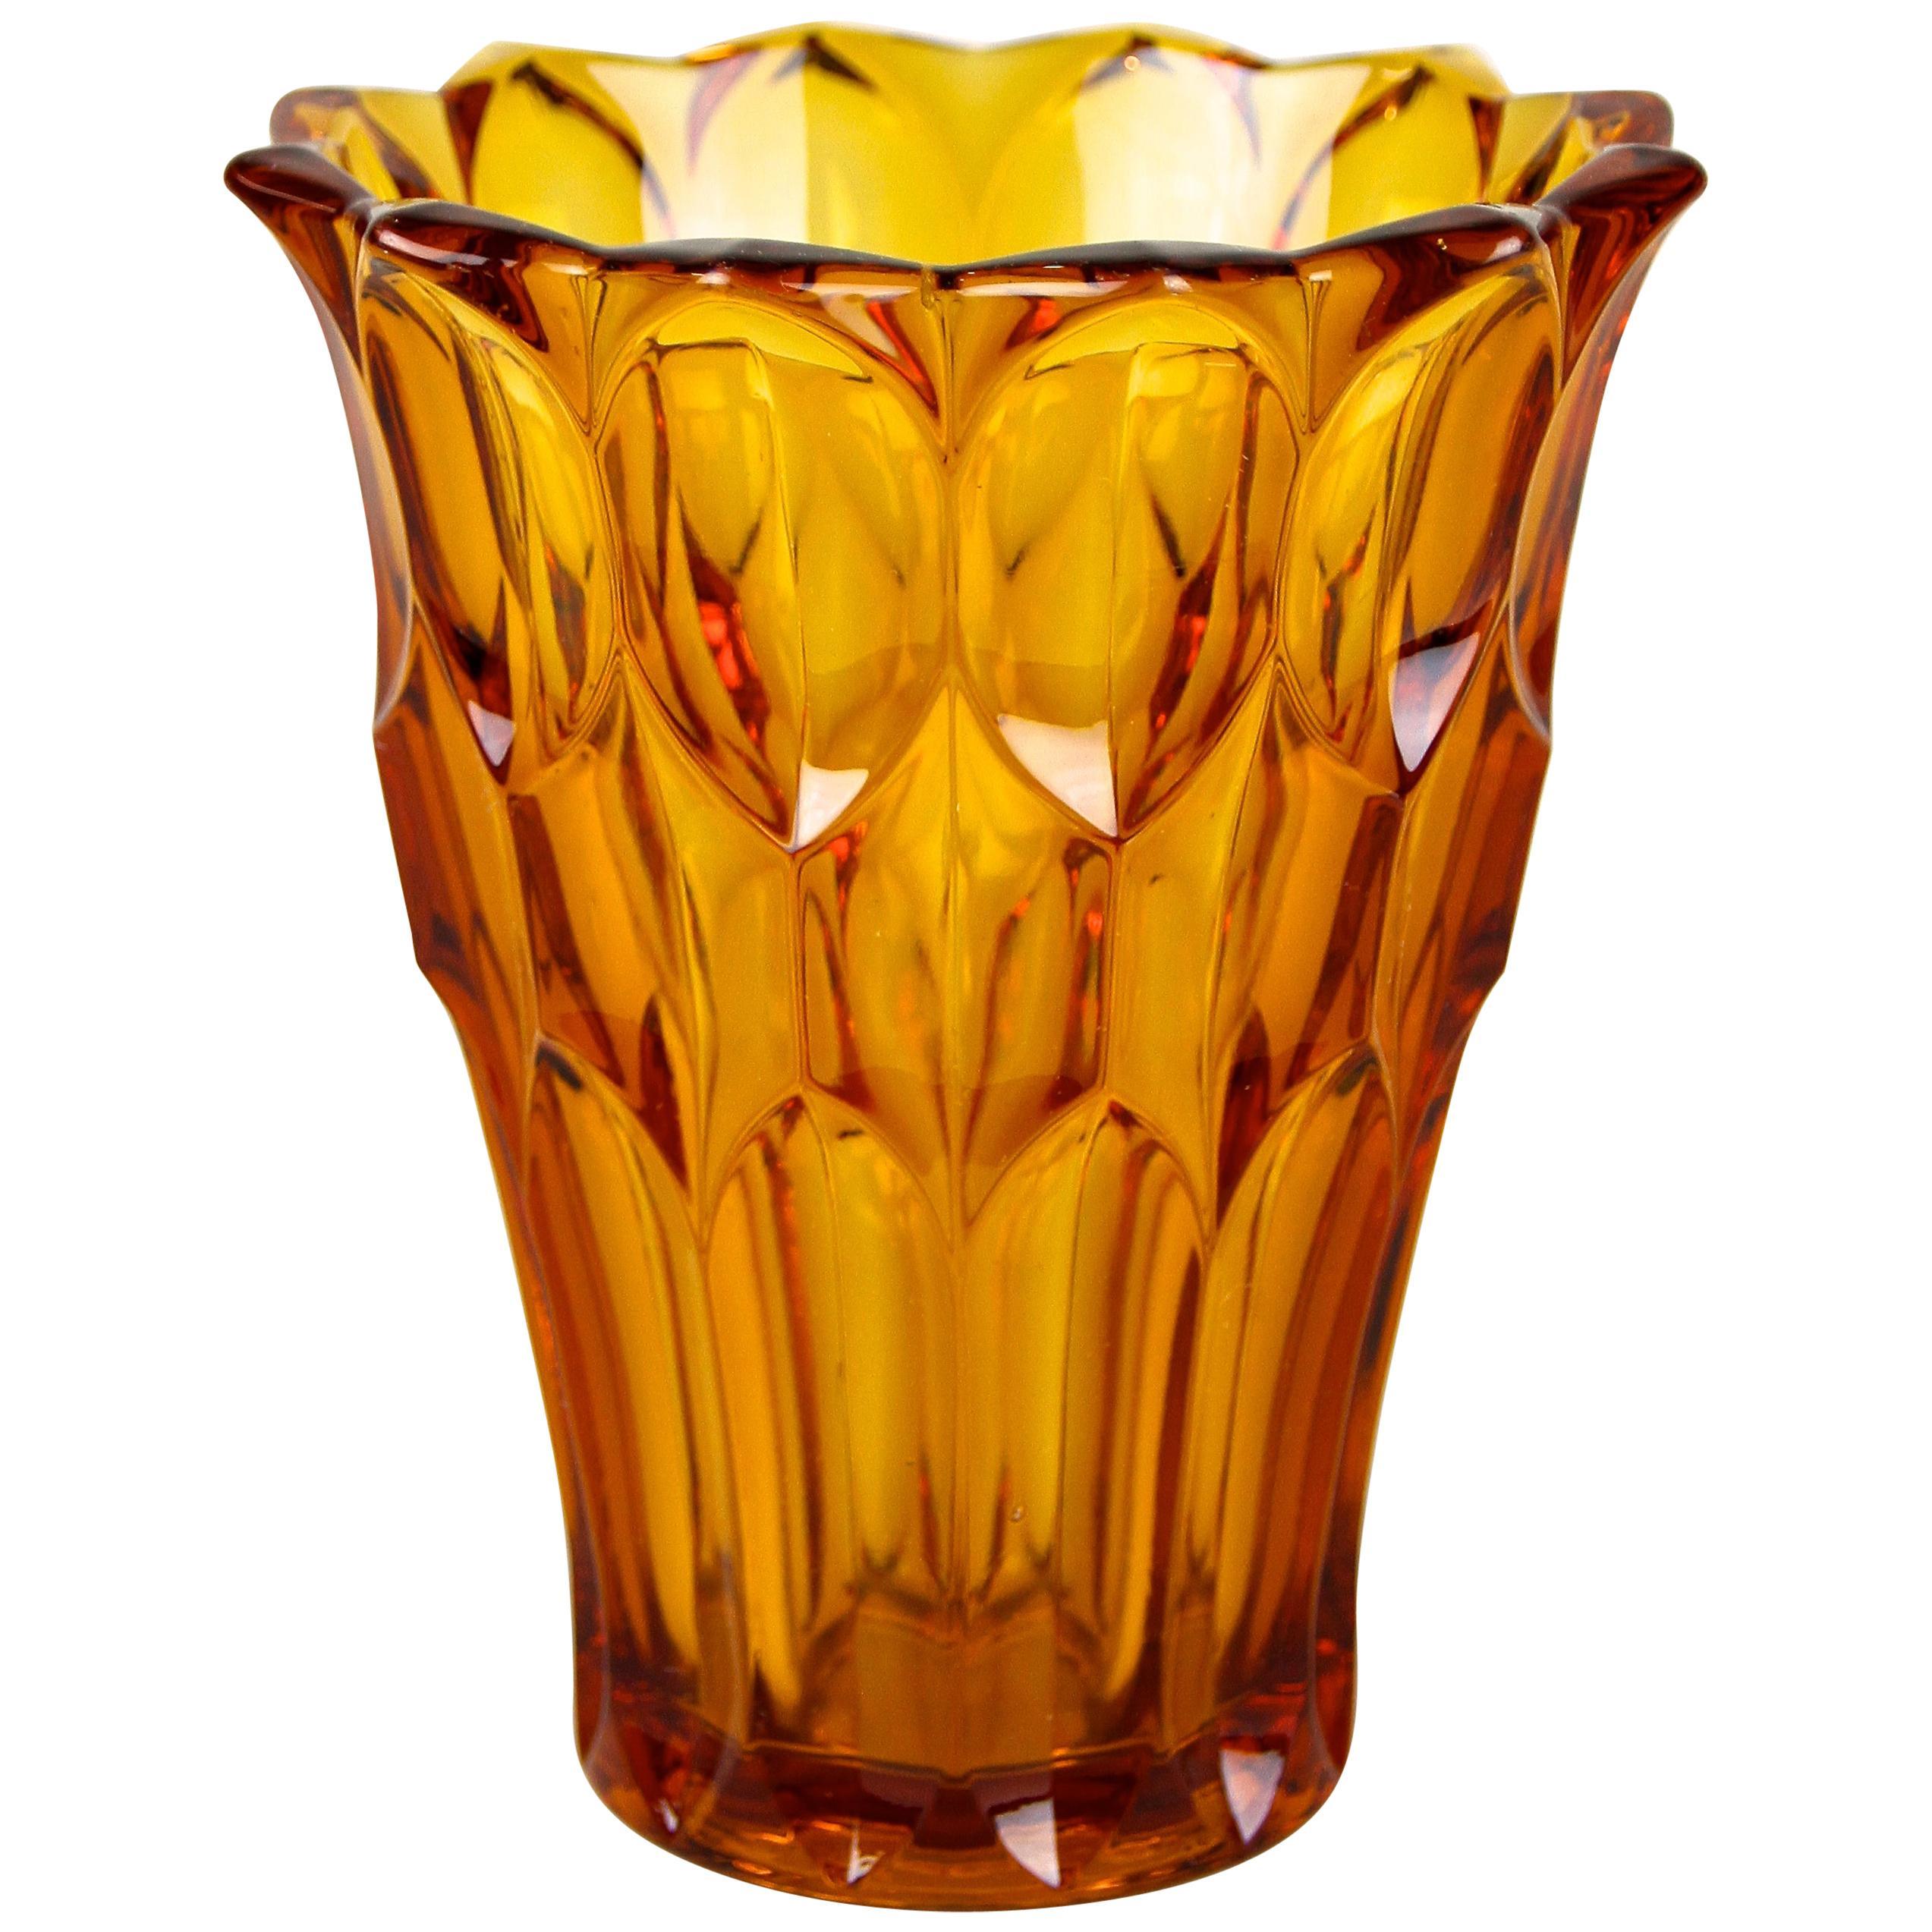 Art Deco Glass Vase Amber Colored, Austria, circa 1920